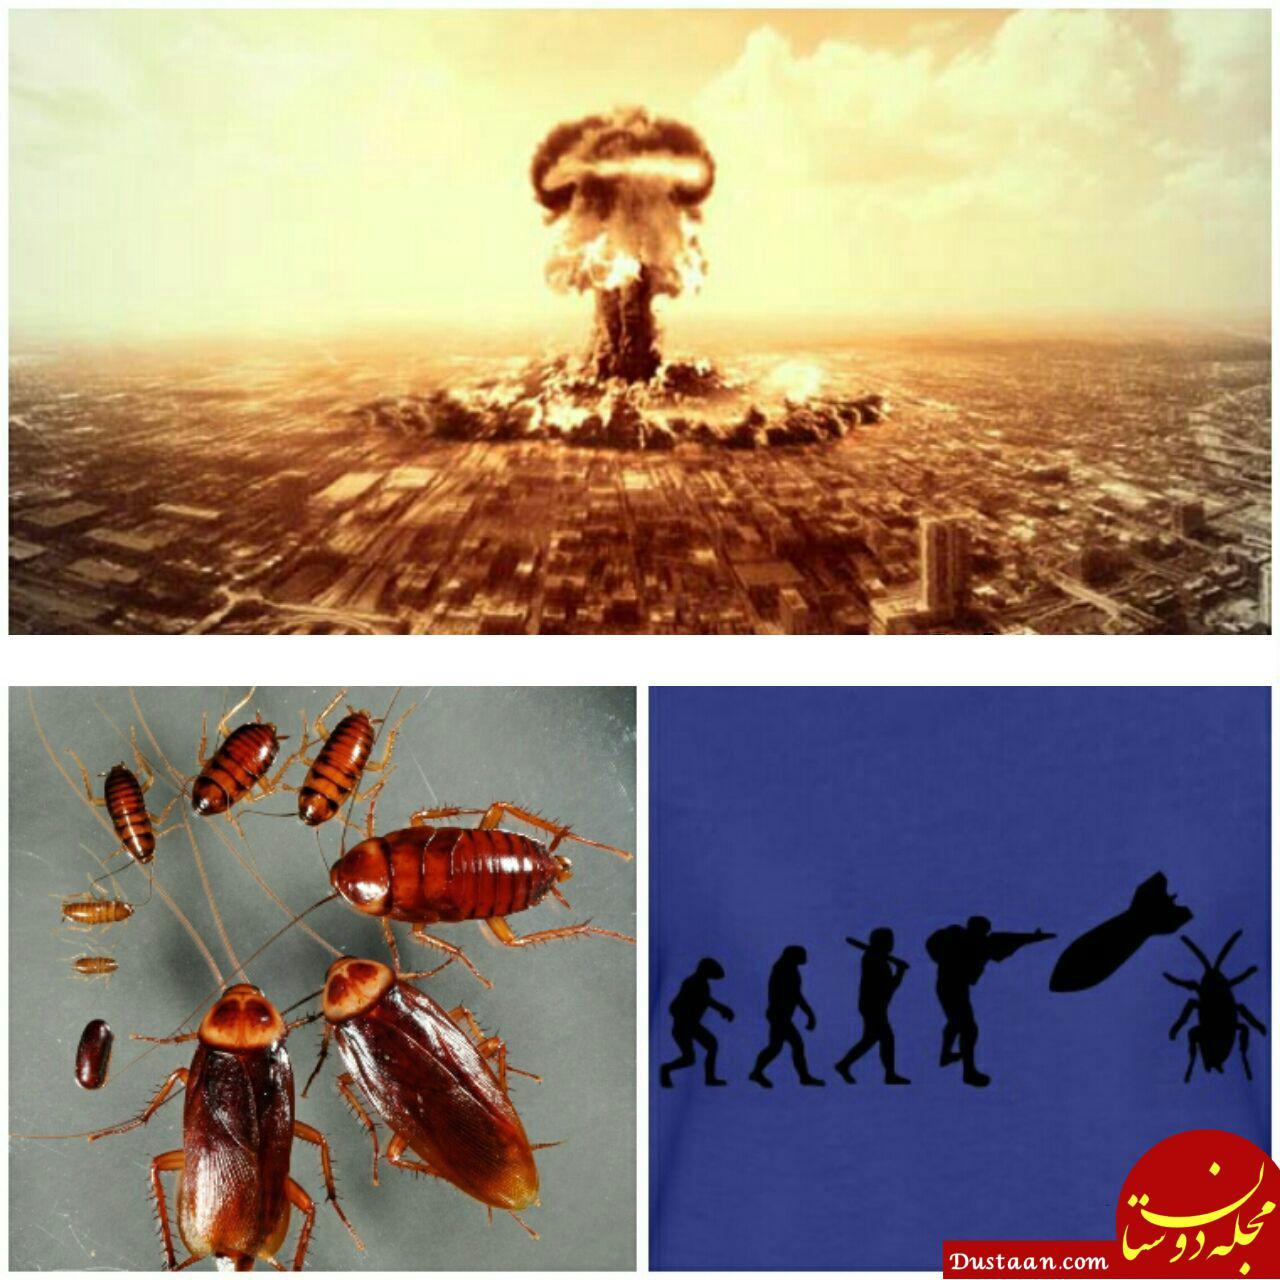 www.dustaan.com تنها موجودی که پس از انفجار بمب اتم زنده می ماند! +عکس